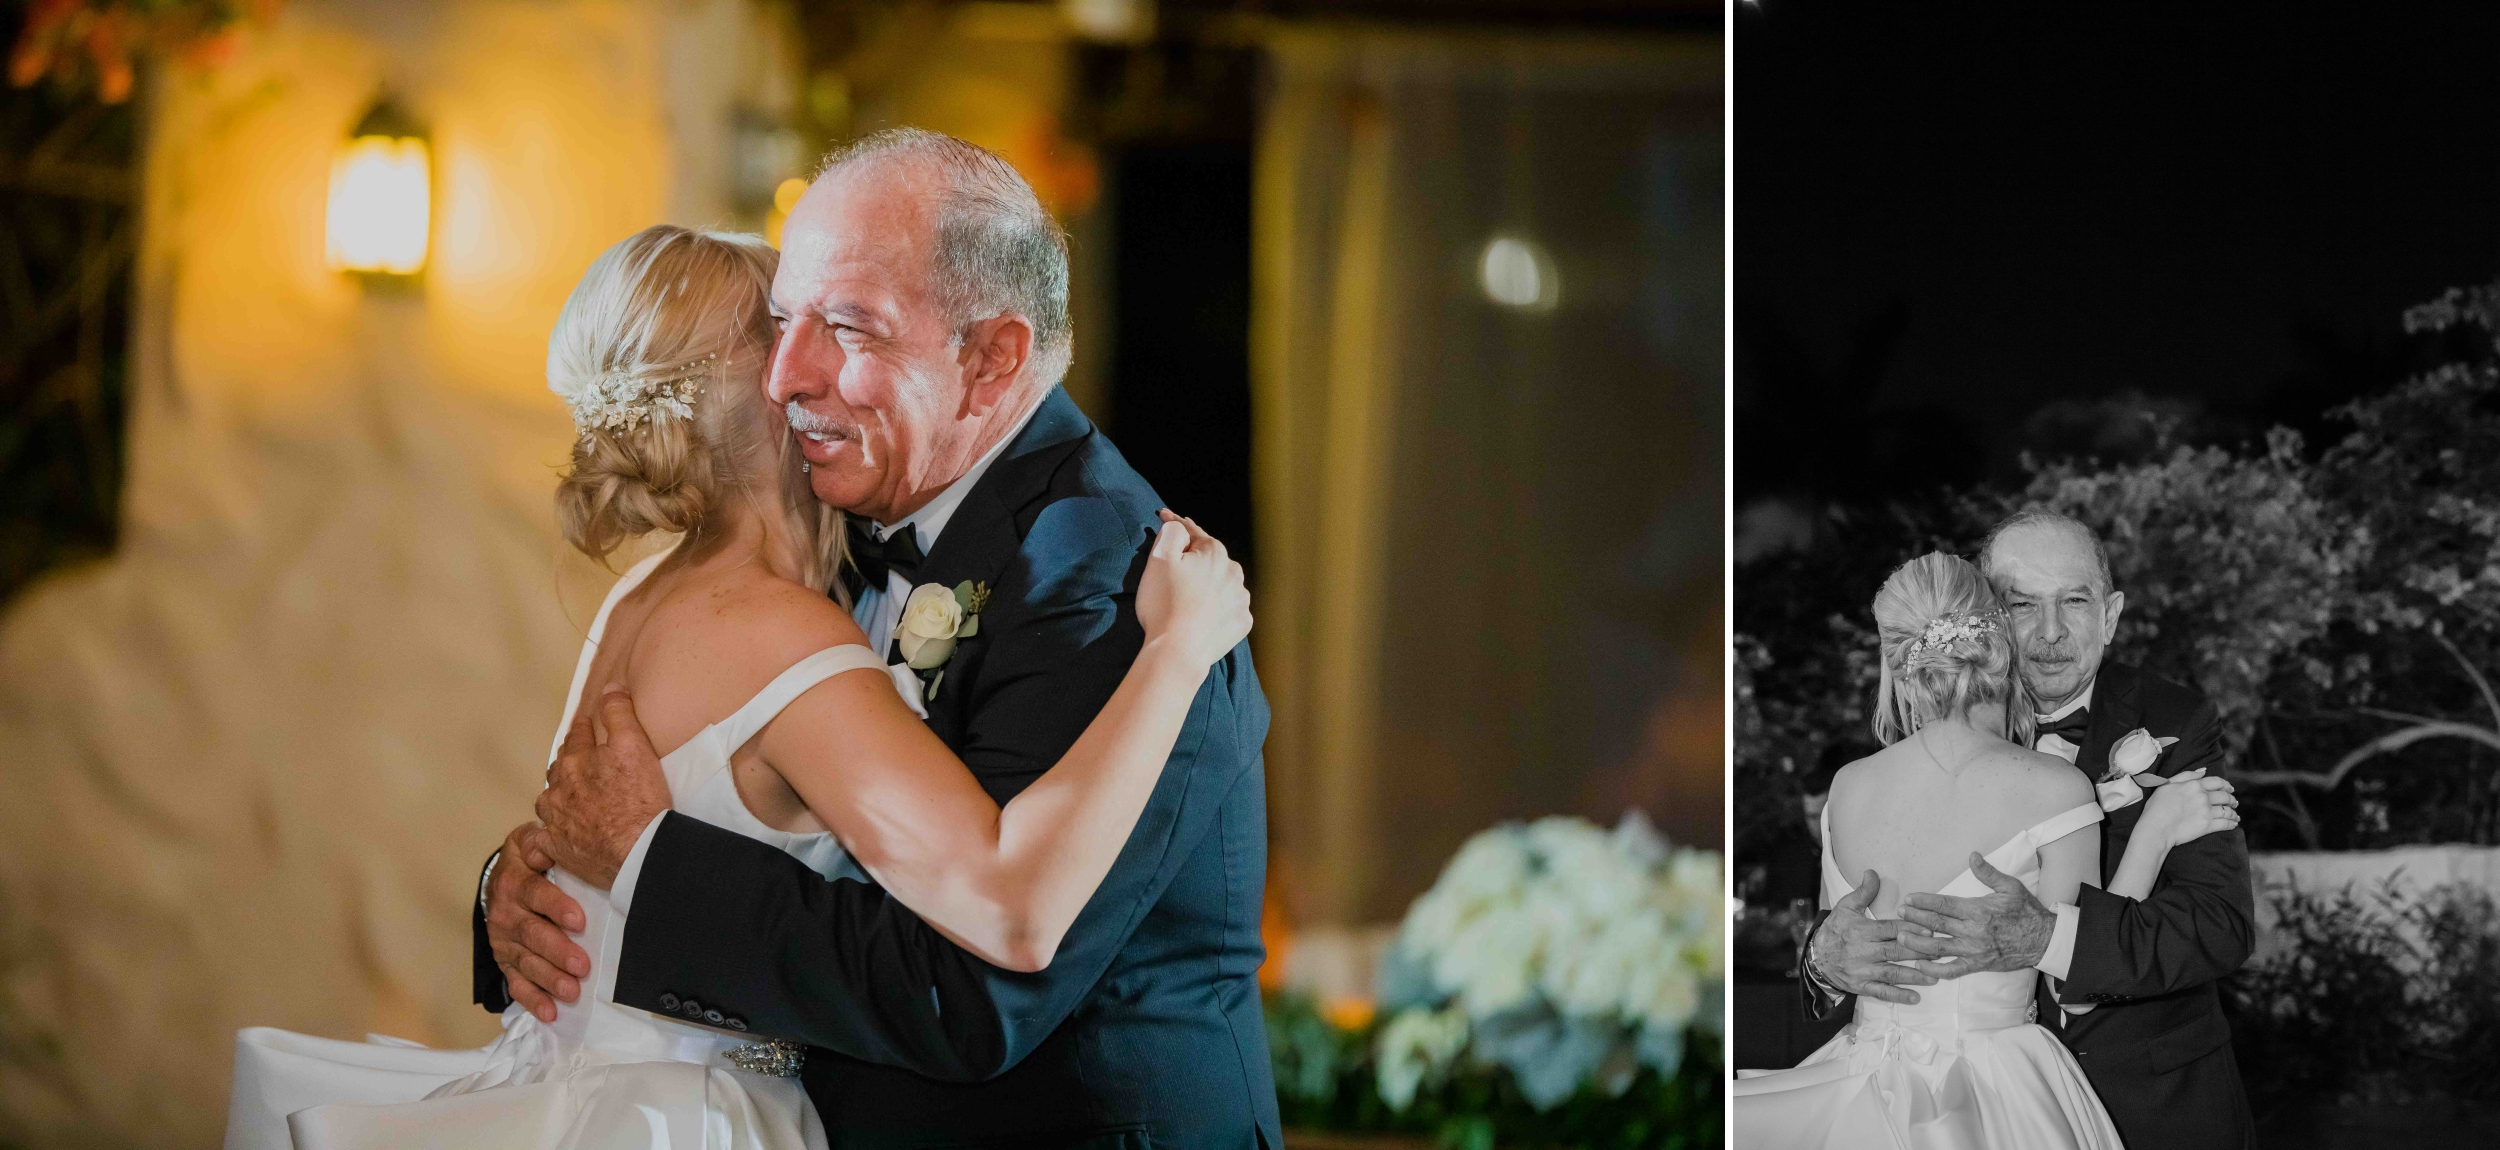 Santy Martinez - Curtiss Masion Wedding 19.jpg